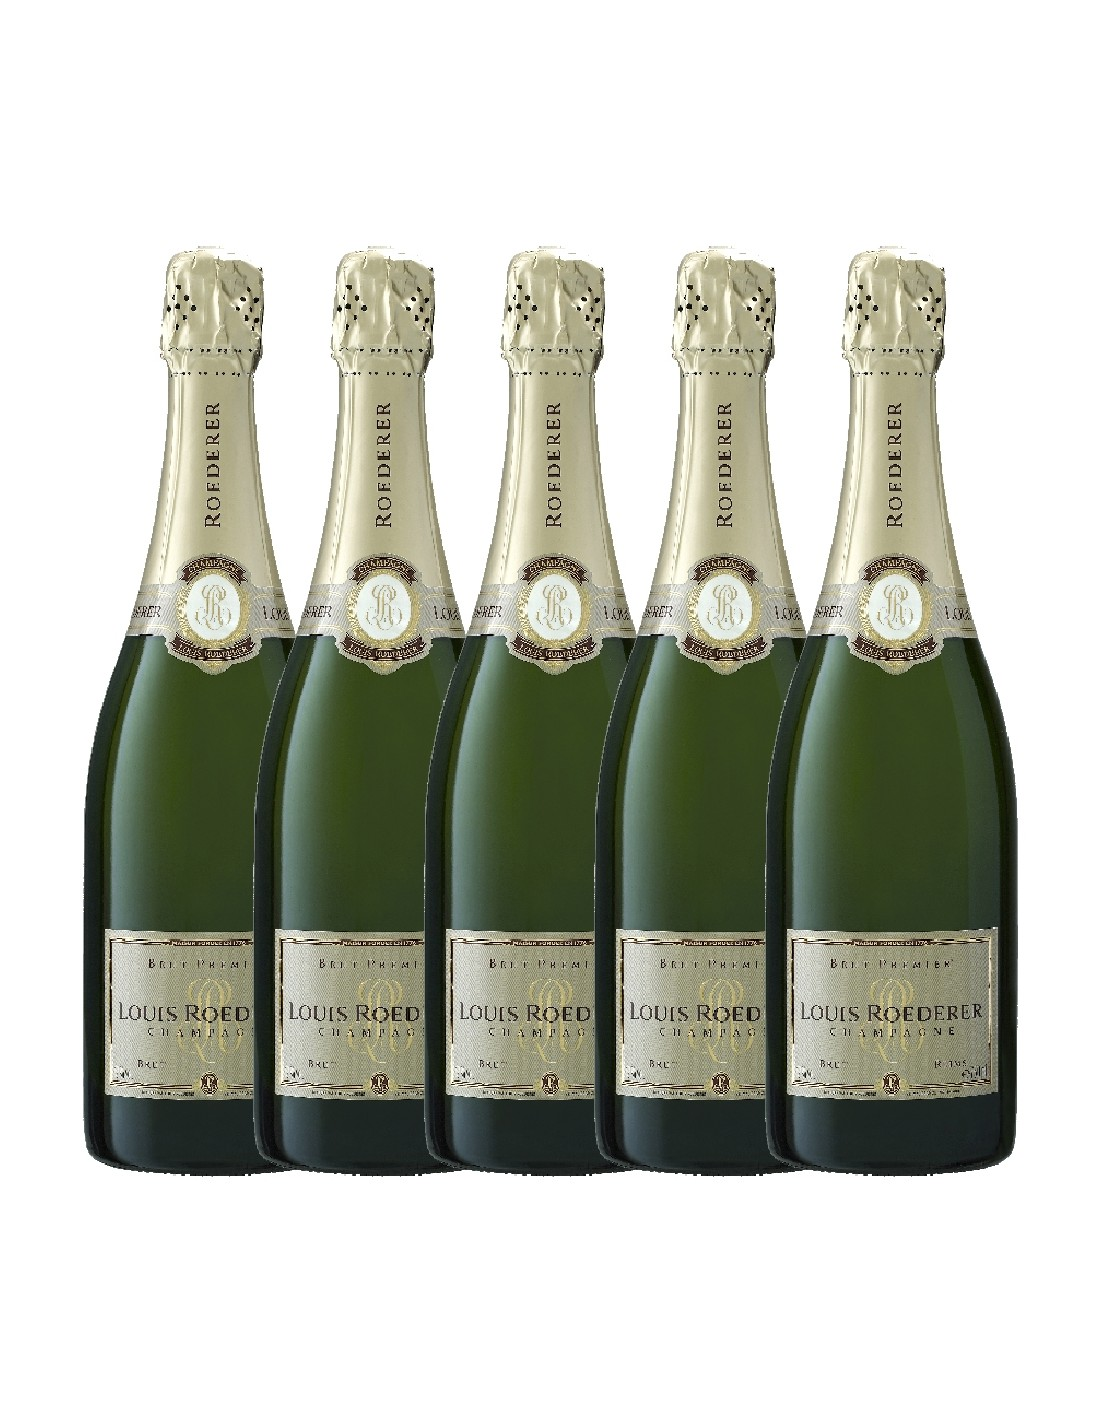 Pachet 5 sticle Sampanie Louis Roederer Premier Brut Champagne, 0.75L, 12% alc., Franta